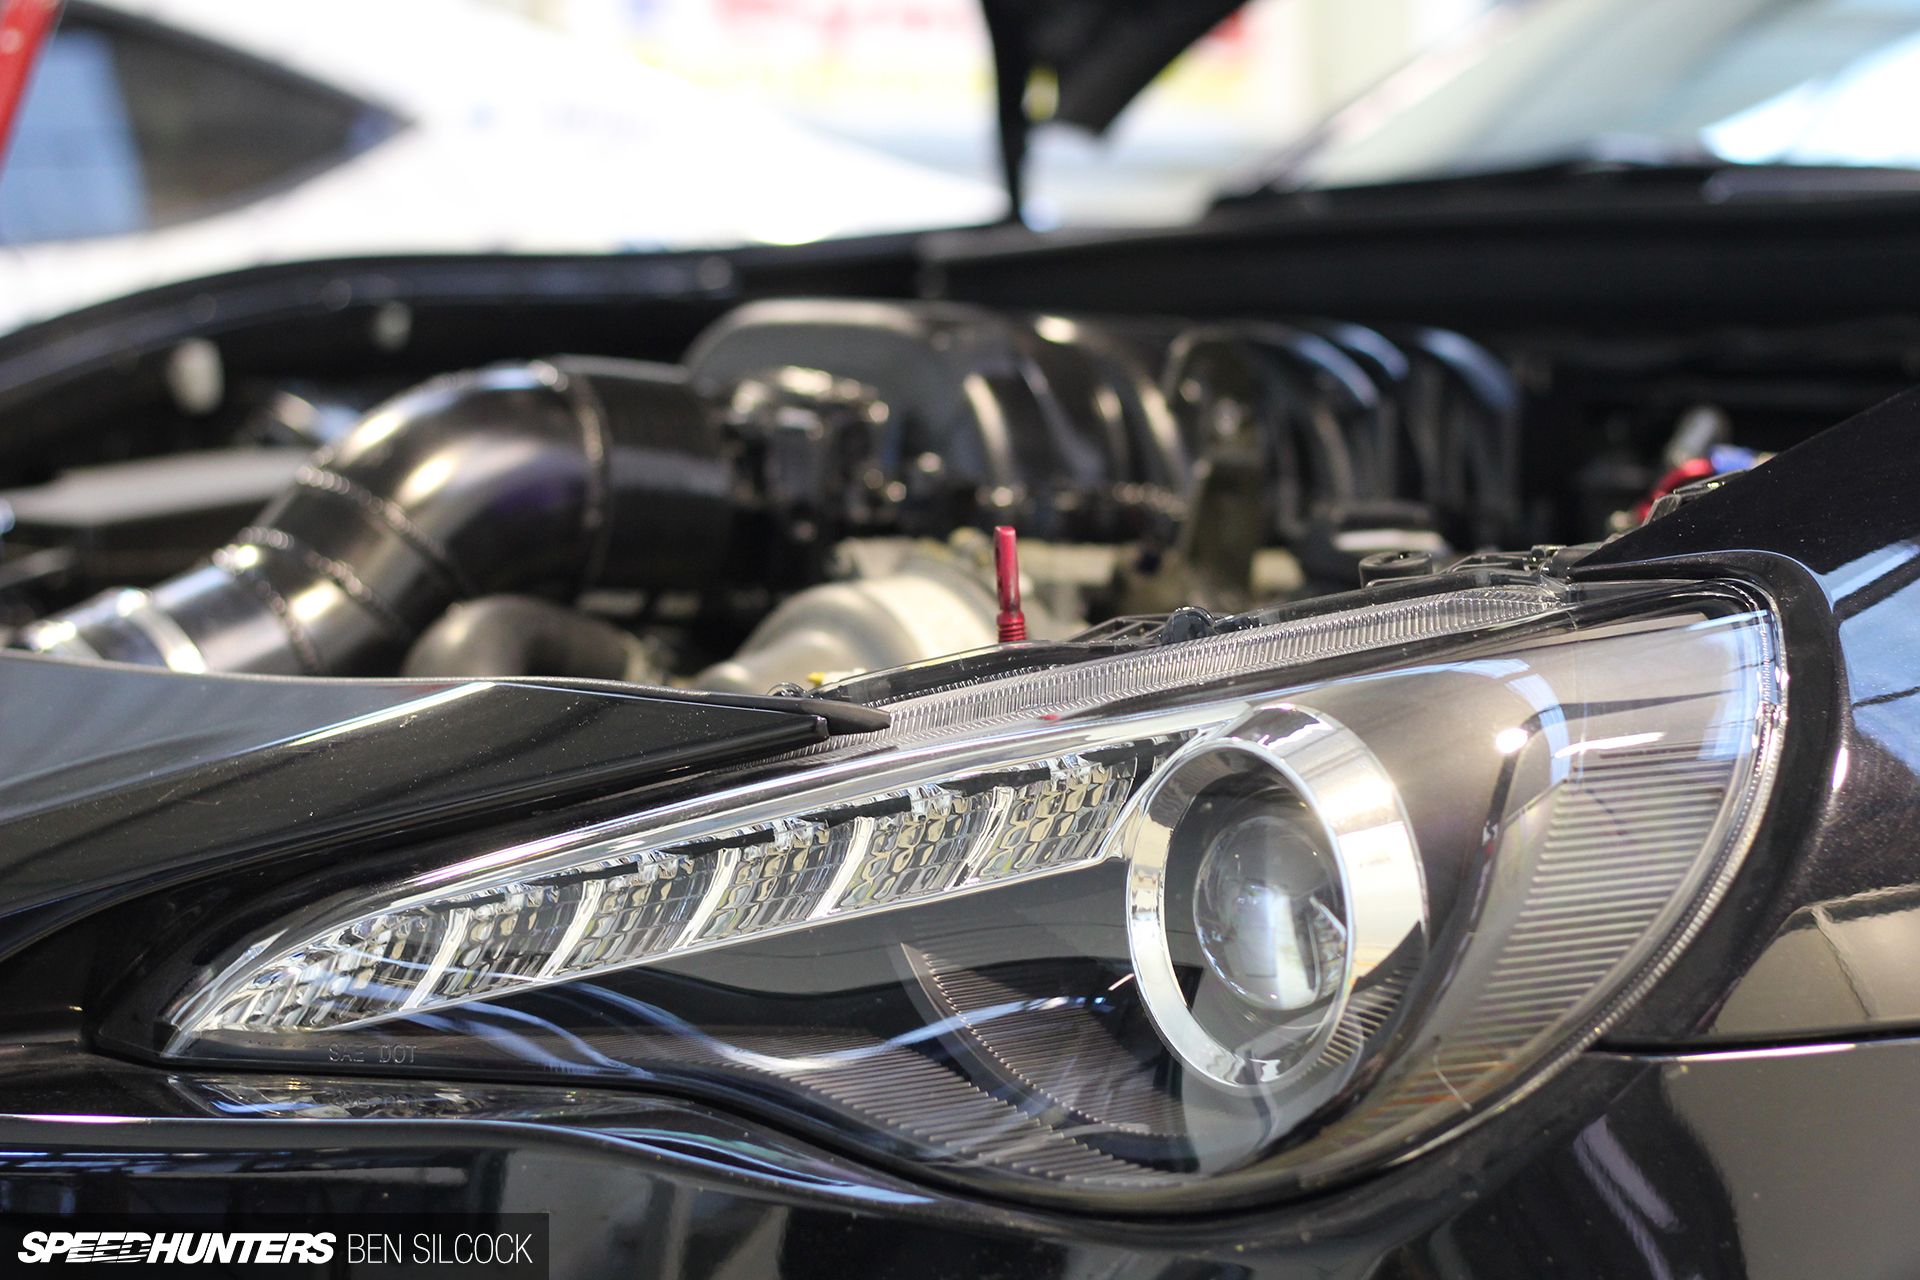 Knowledge boost engine swap intricacies